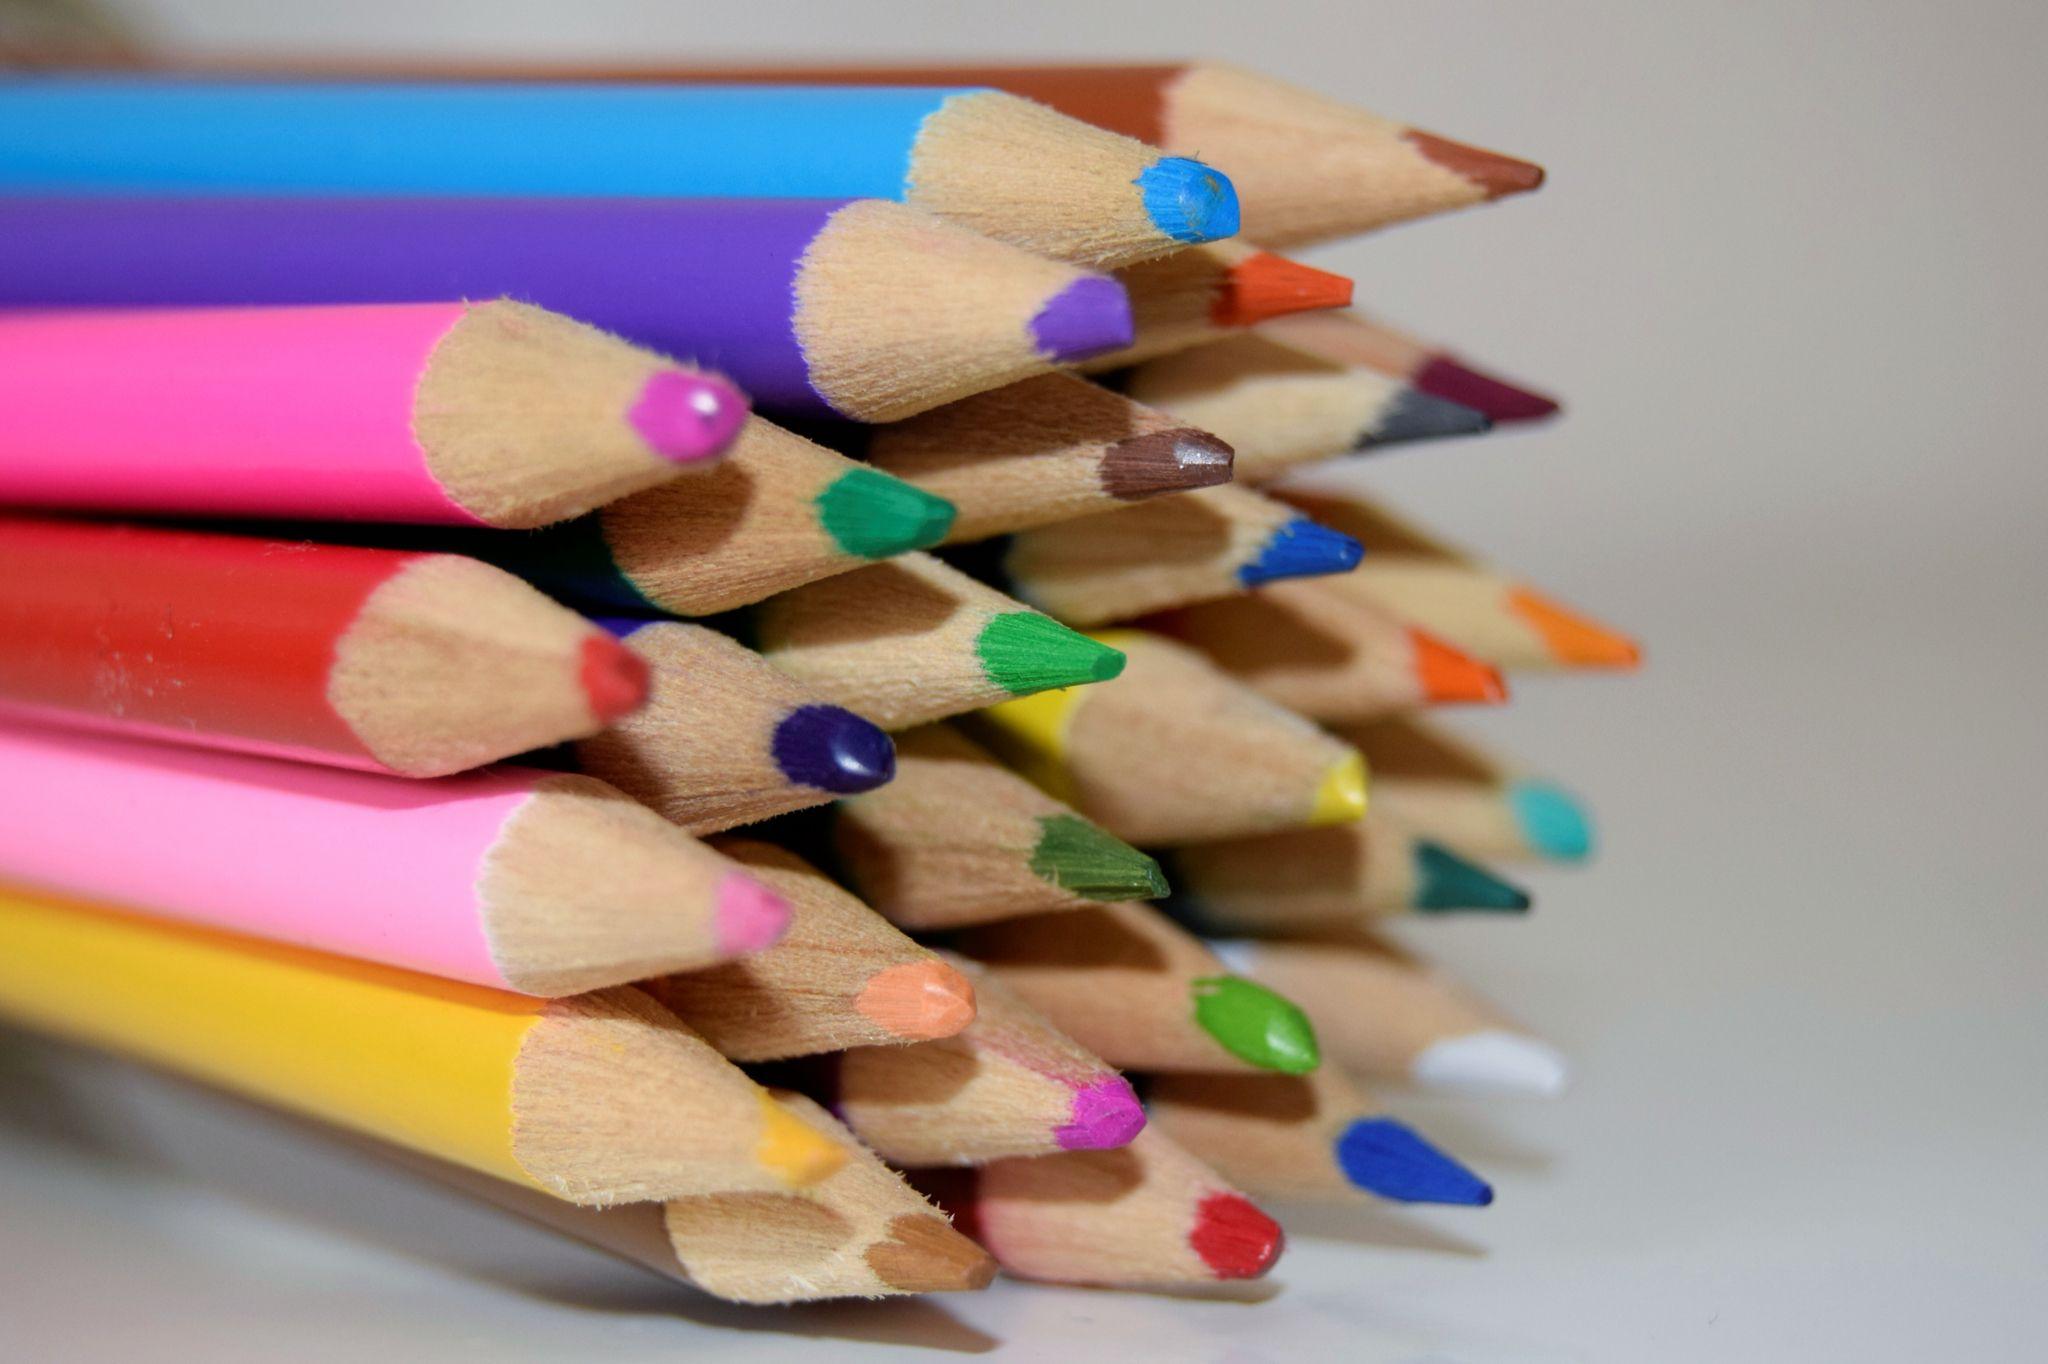 Free Colored Pencils Stock Photo - FreeImages.com